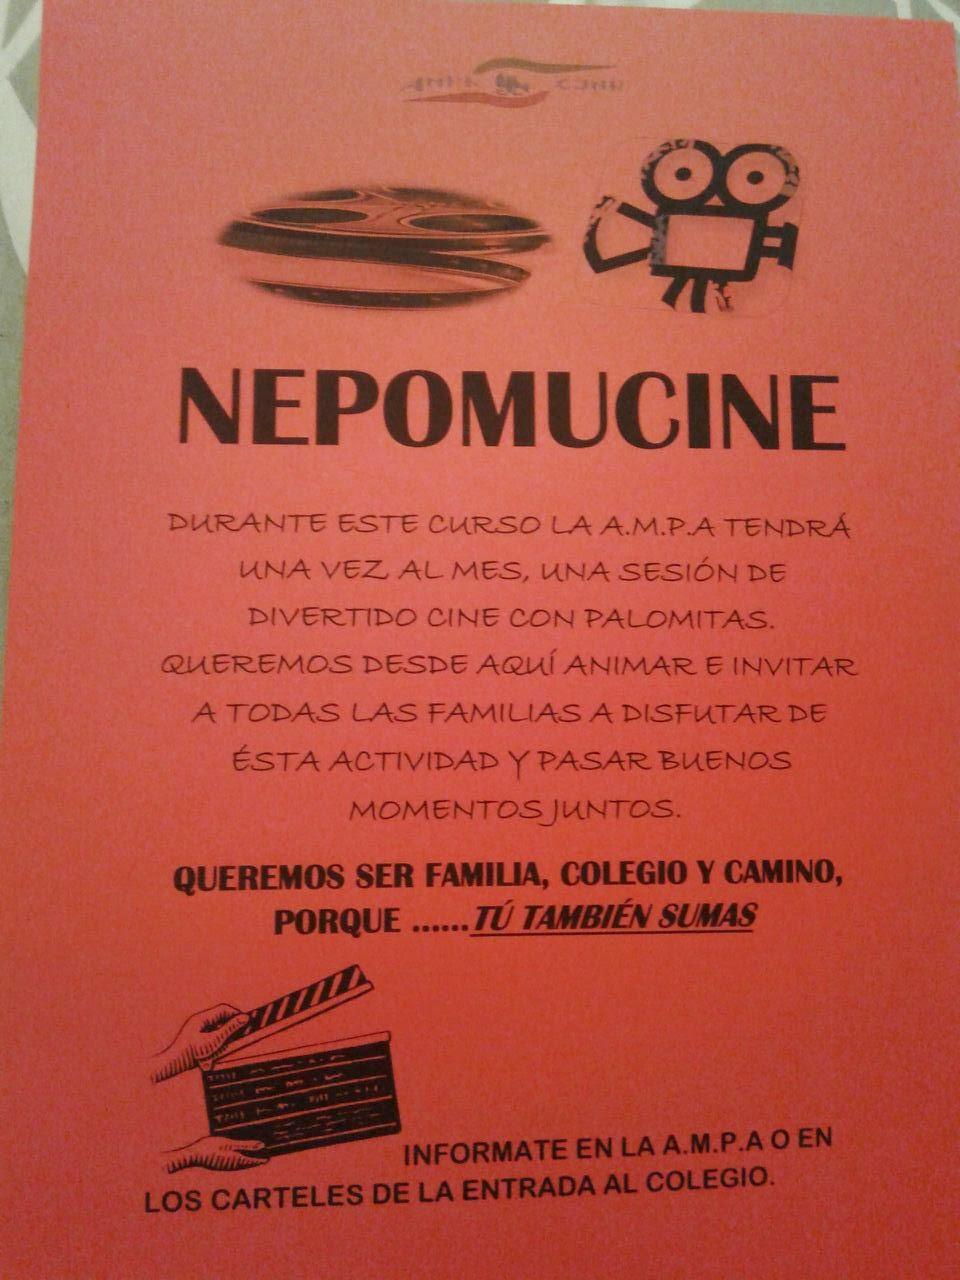 NEPOMUCINE